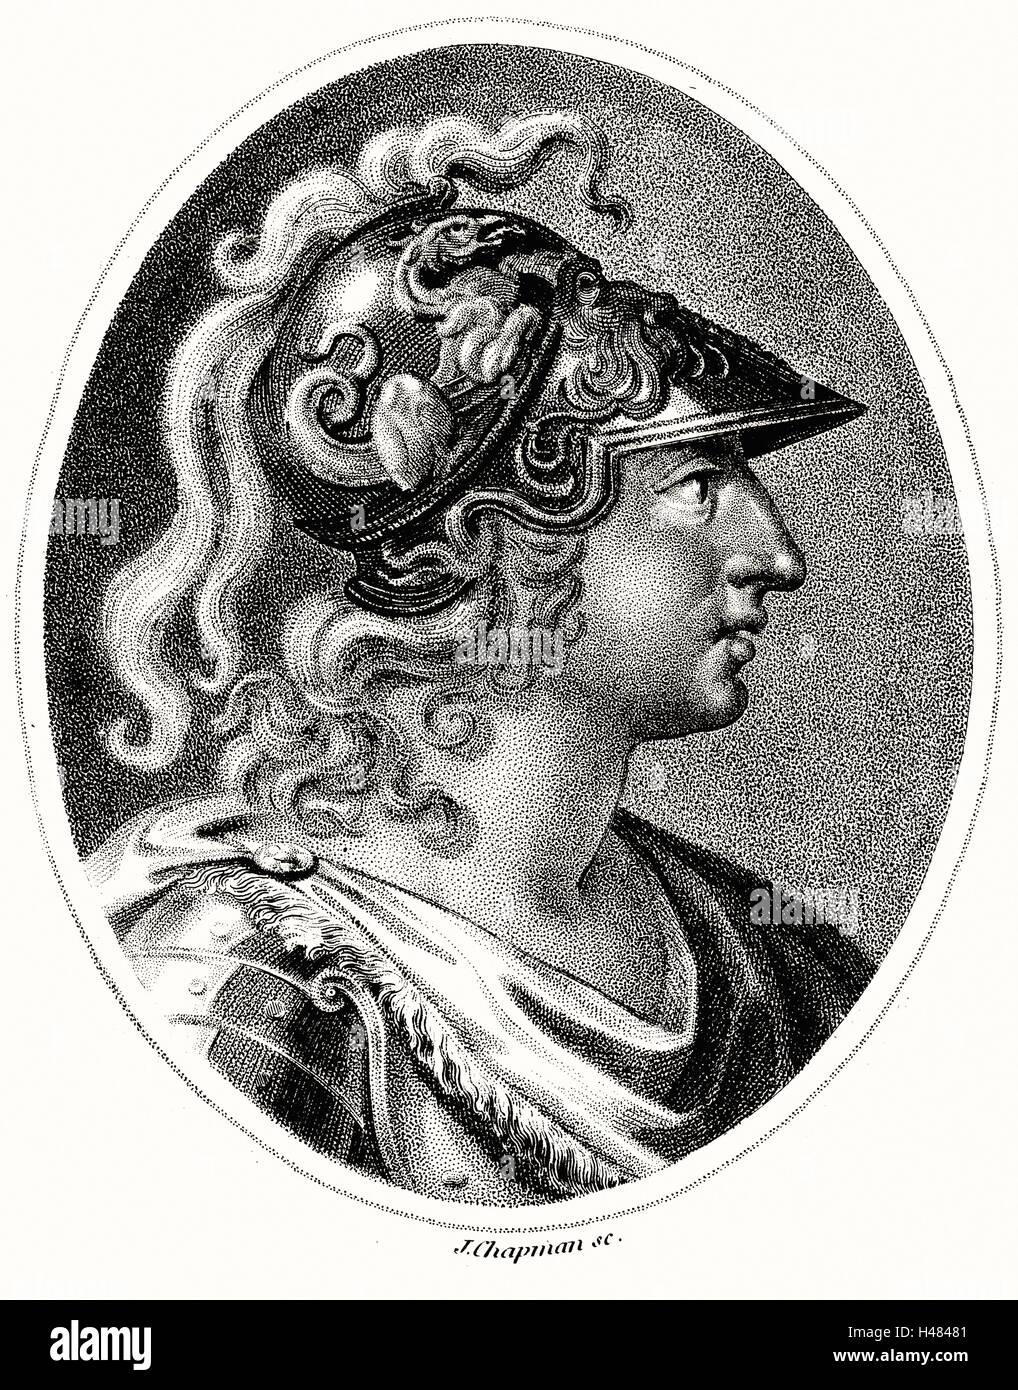 alexander iii of macedon Alexandros iii philippou makedonon (alexander the great, alexander iii of macedon) (356-323 bc), king of macedonia, born in late july 356 bc in pella, macedonia, one of the greatest military genius in history.